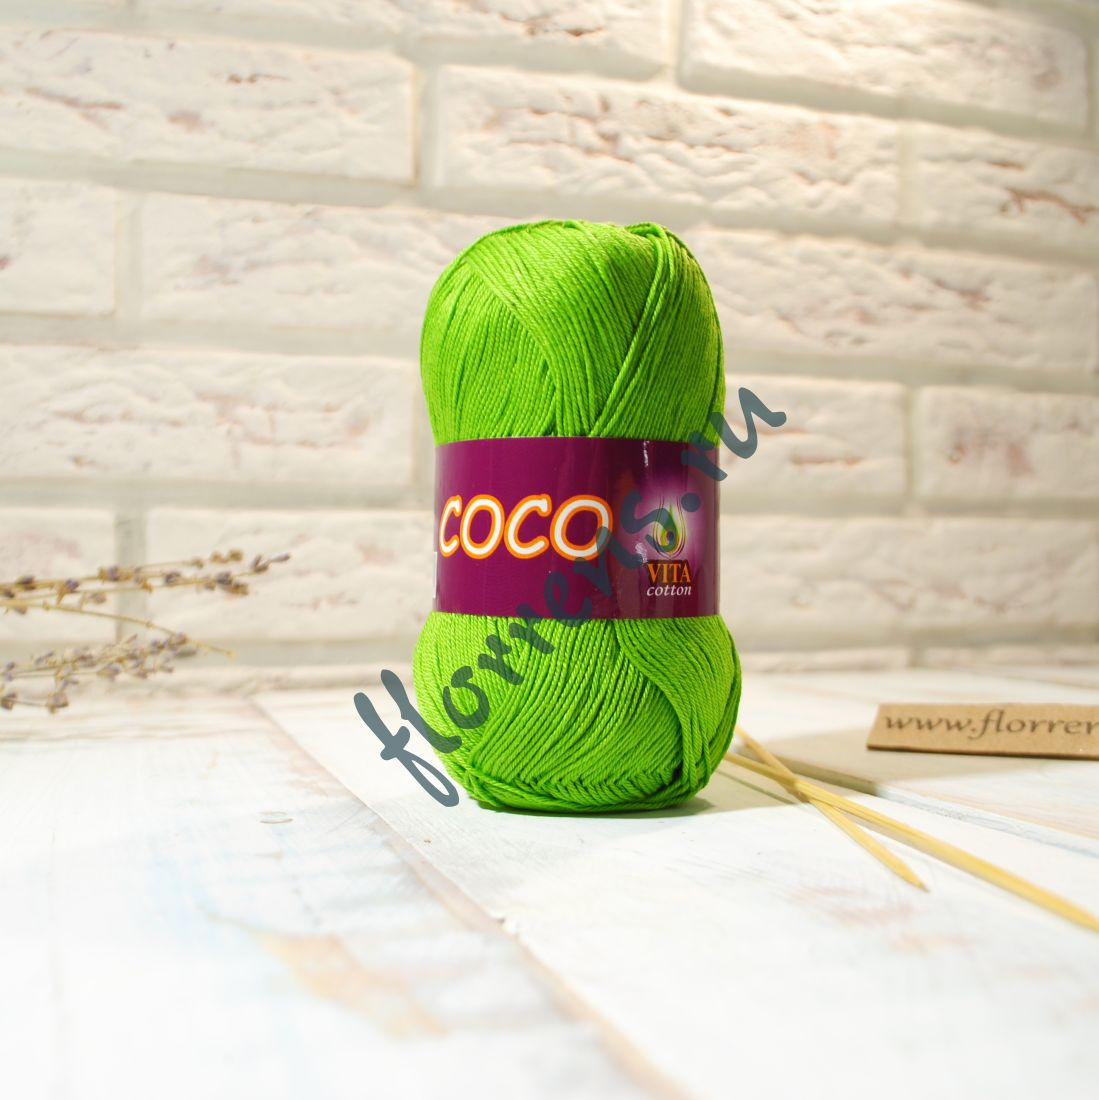 Пряжа Coco / 3861 ярко-зеленый